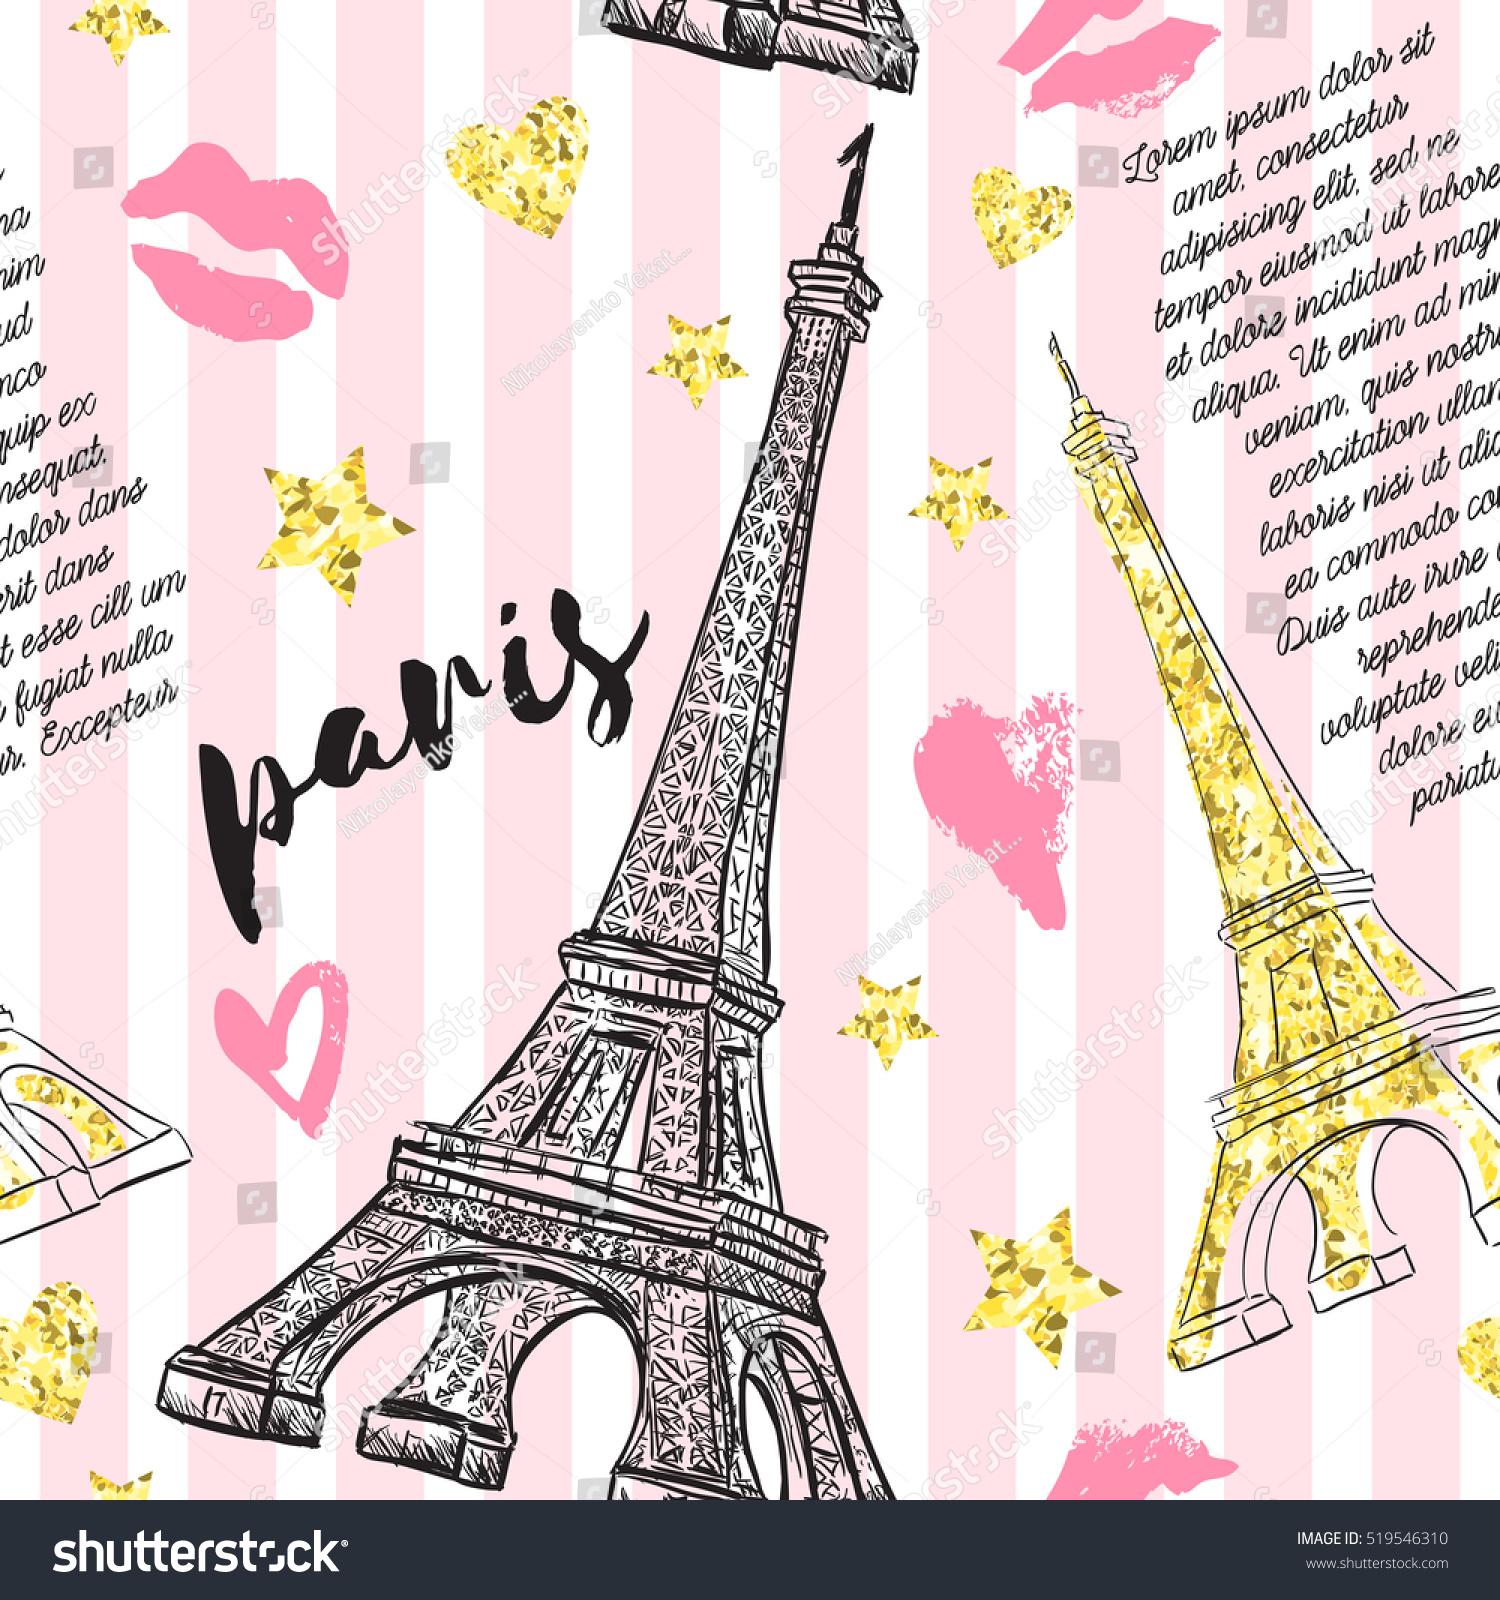 Gambar Wallpaper Paris Lucu